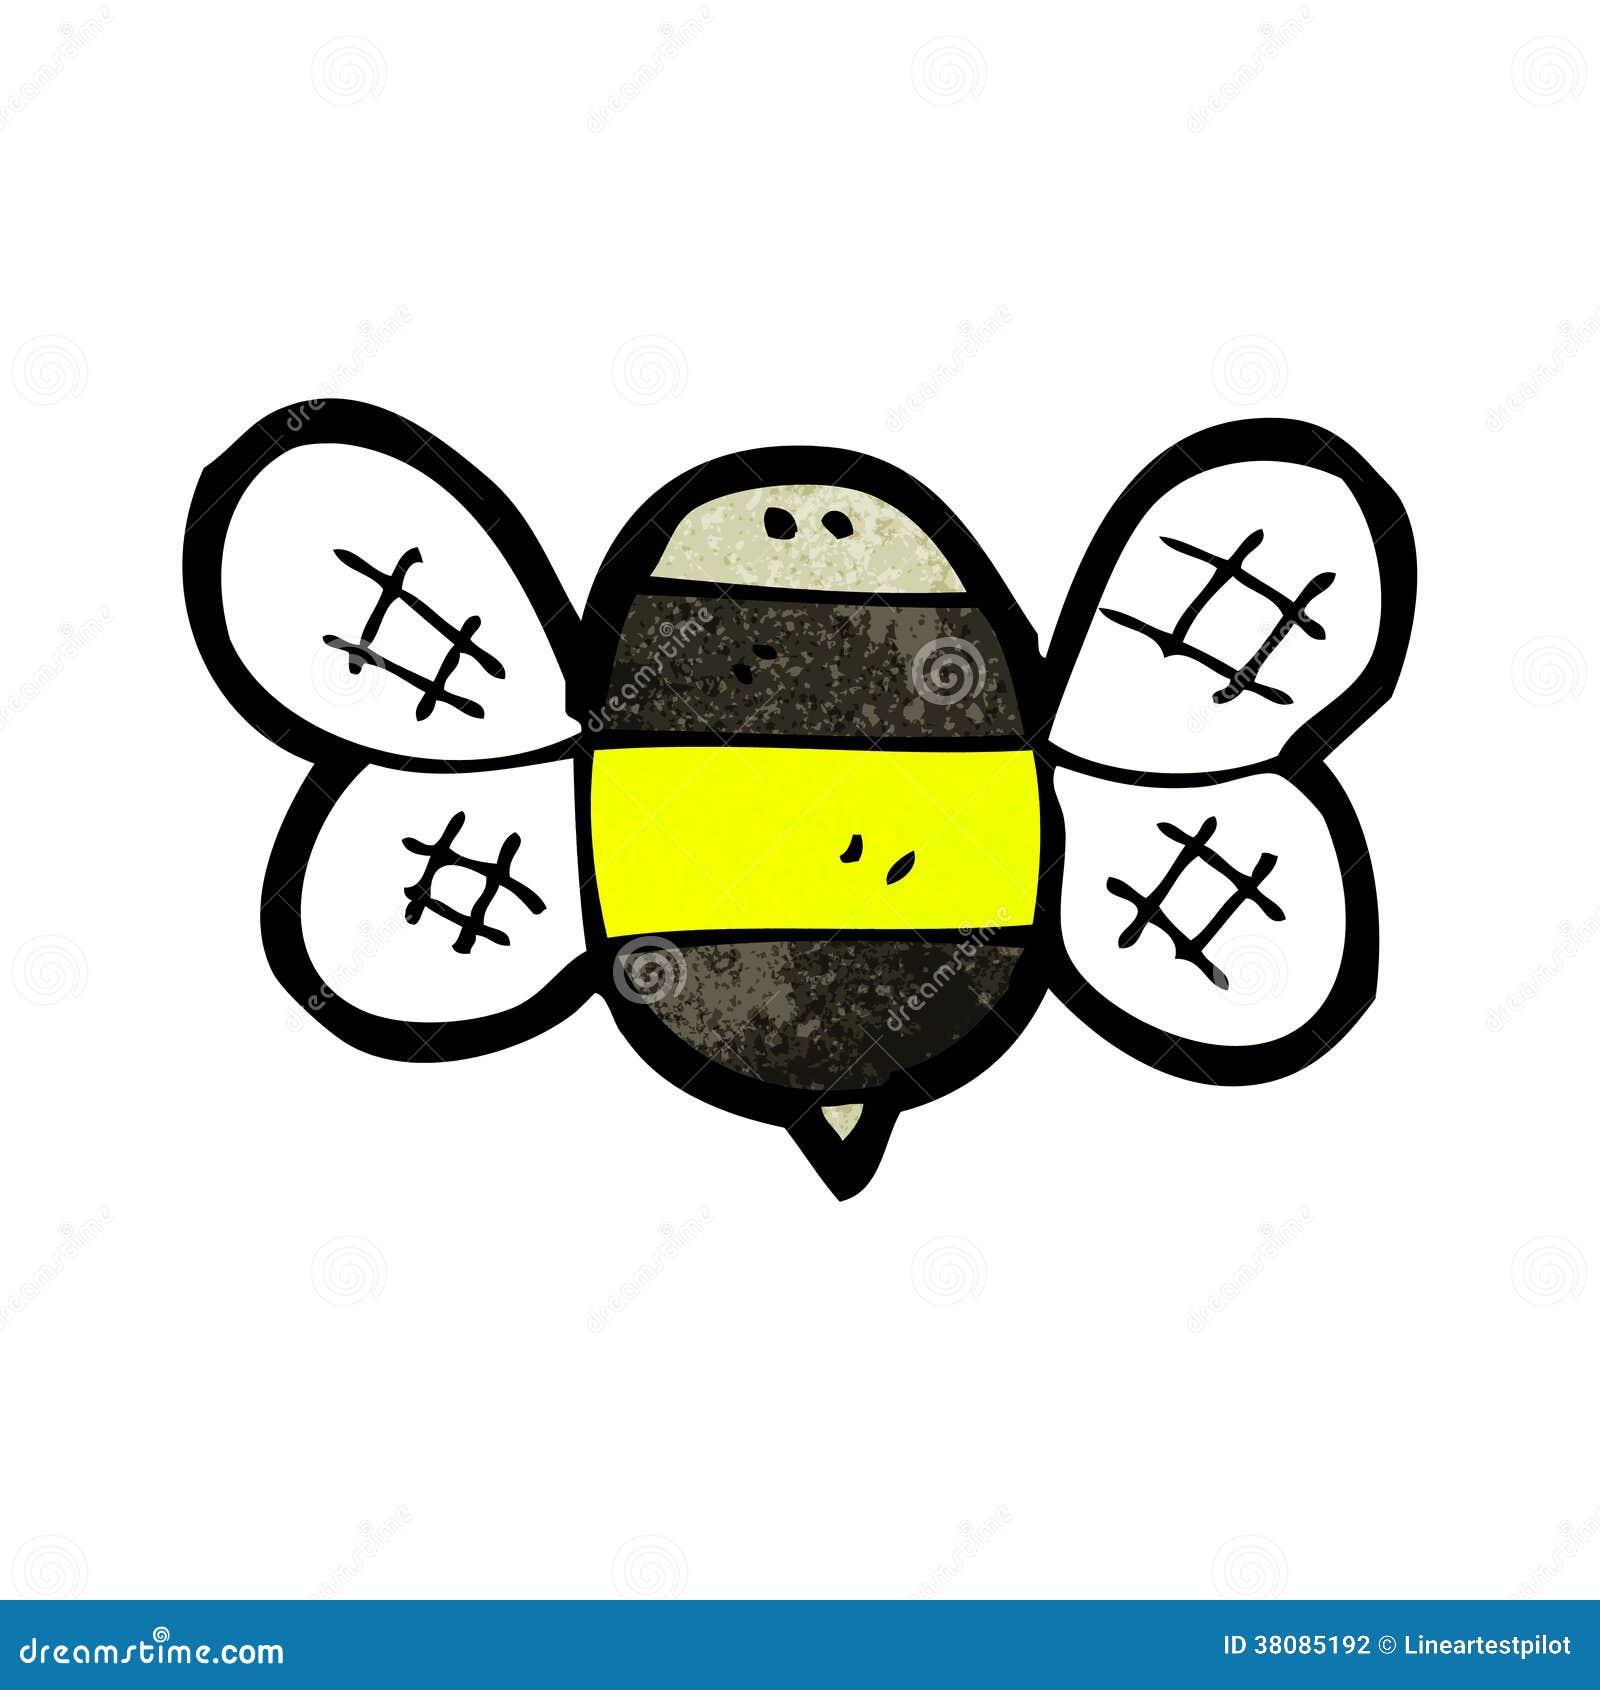 Cartoon bumble bee stock vector illustration of retro 38085192 royalty free stock photo biocorpaavc